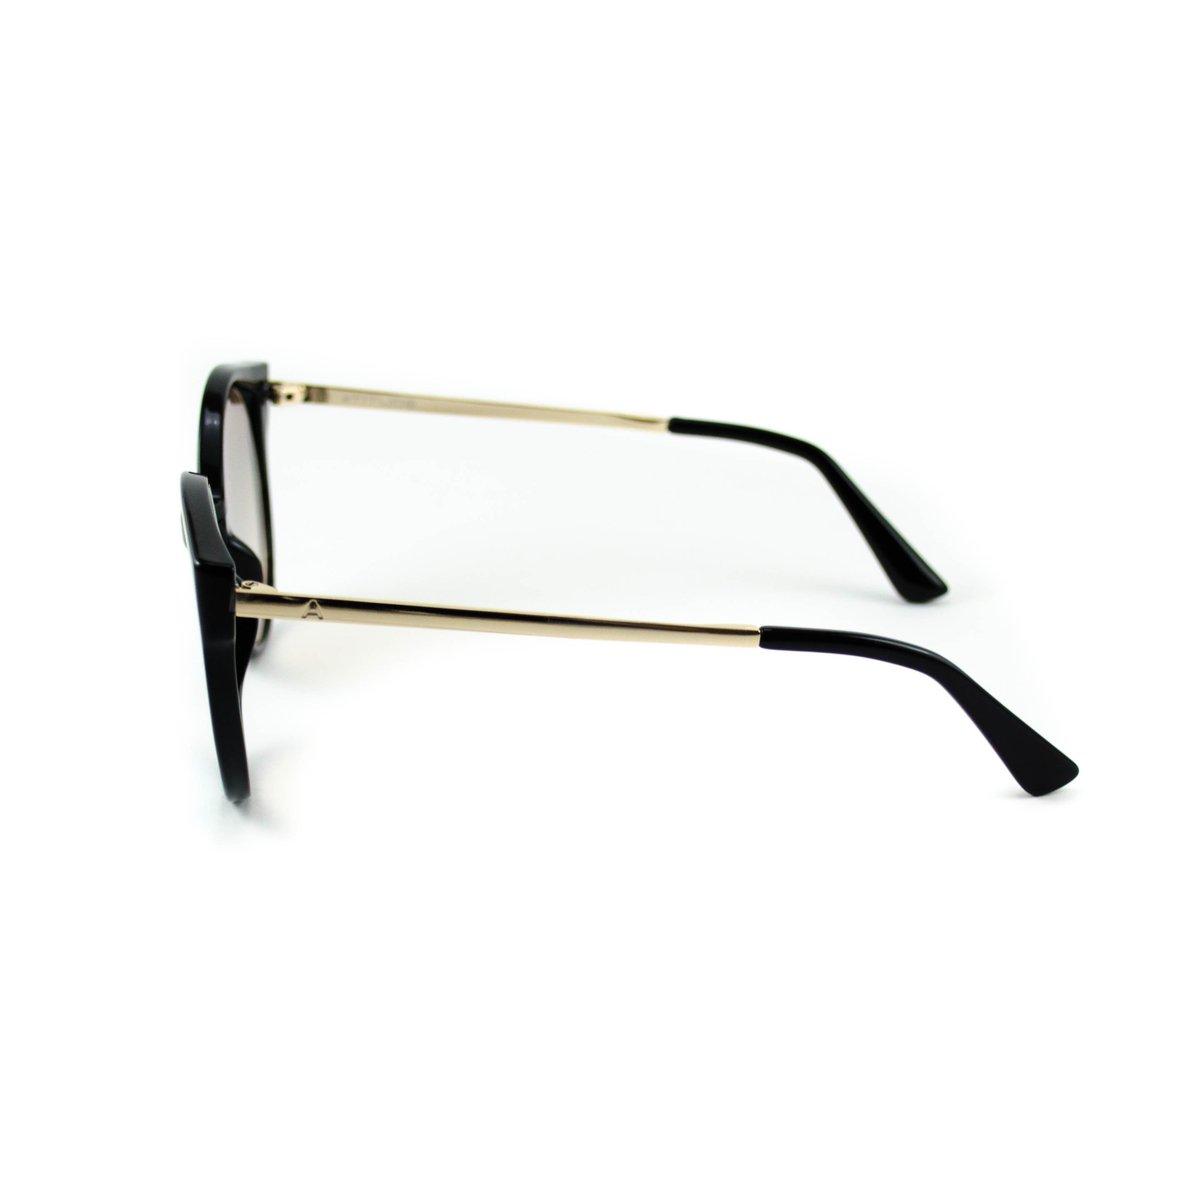 Óculos Atitude - AT5374 T01 - Preto e Dourado